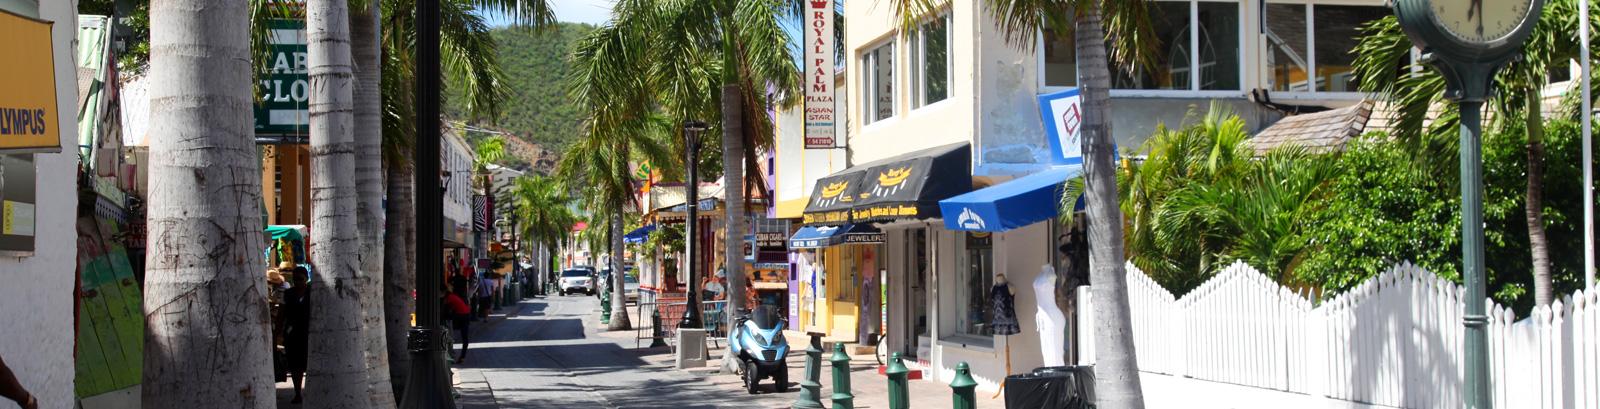 Joe's Jewelry - Nos recommandations au Simpson Bay Resort